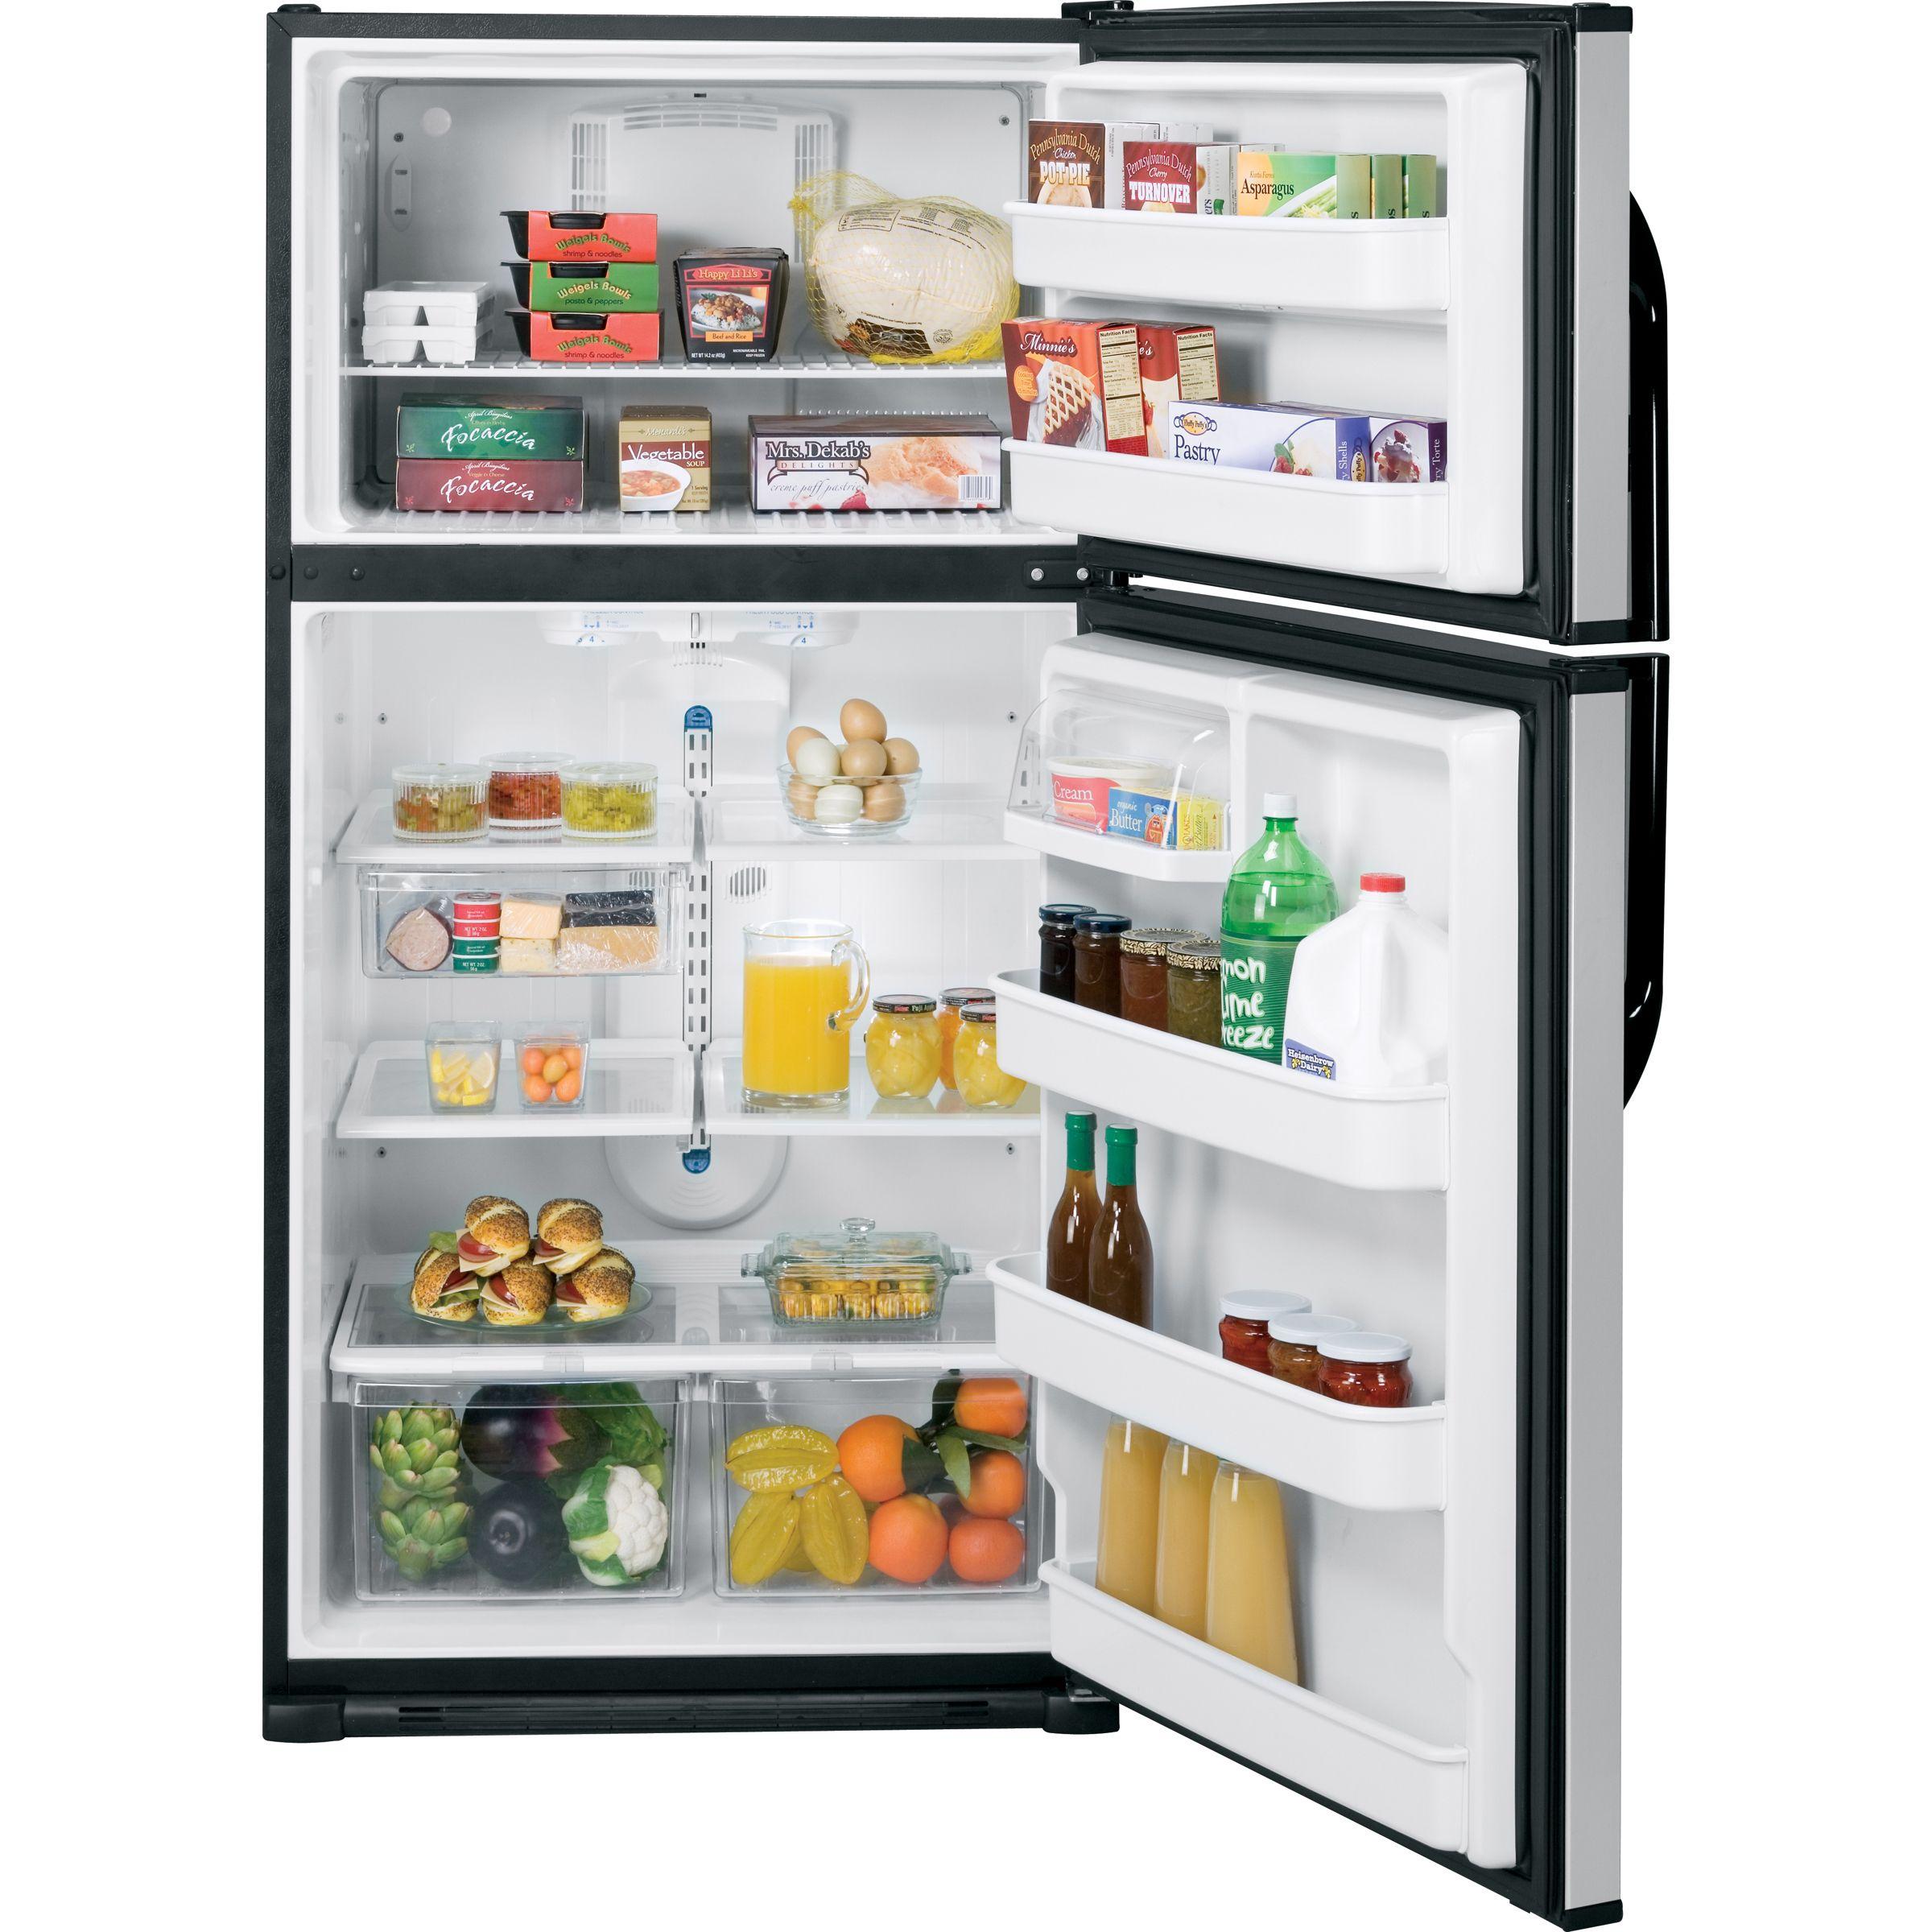 GE 21.0 cu. ft. Top Freezer Refrigerator (GTL21KBX)